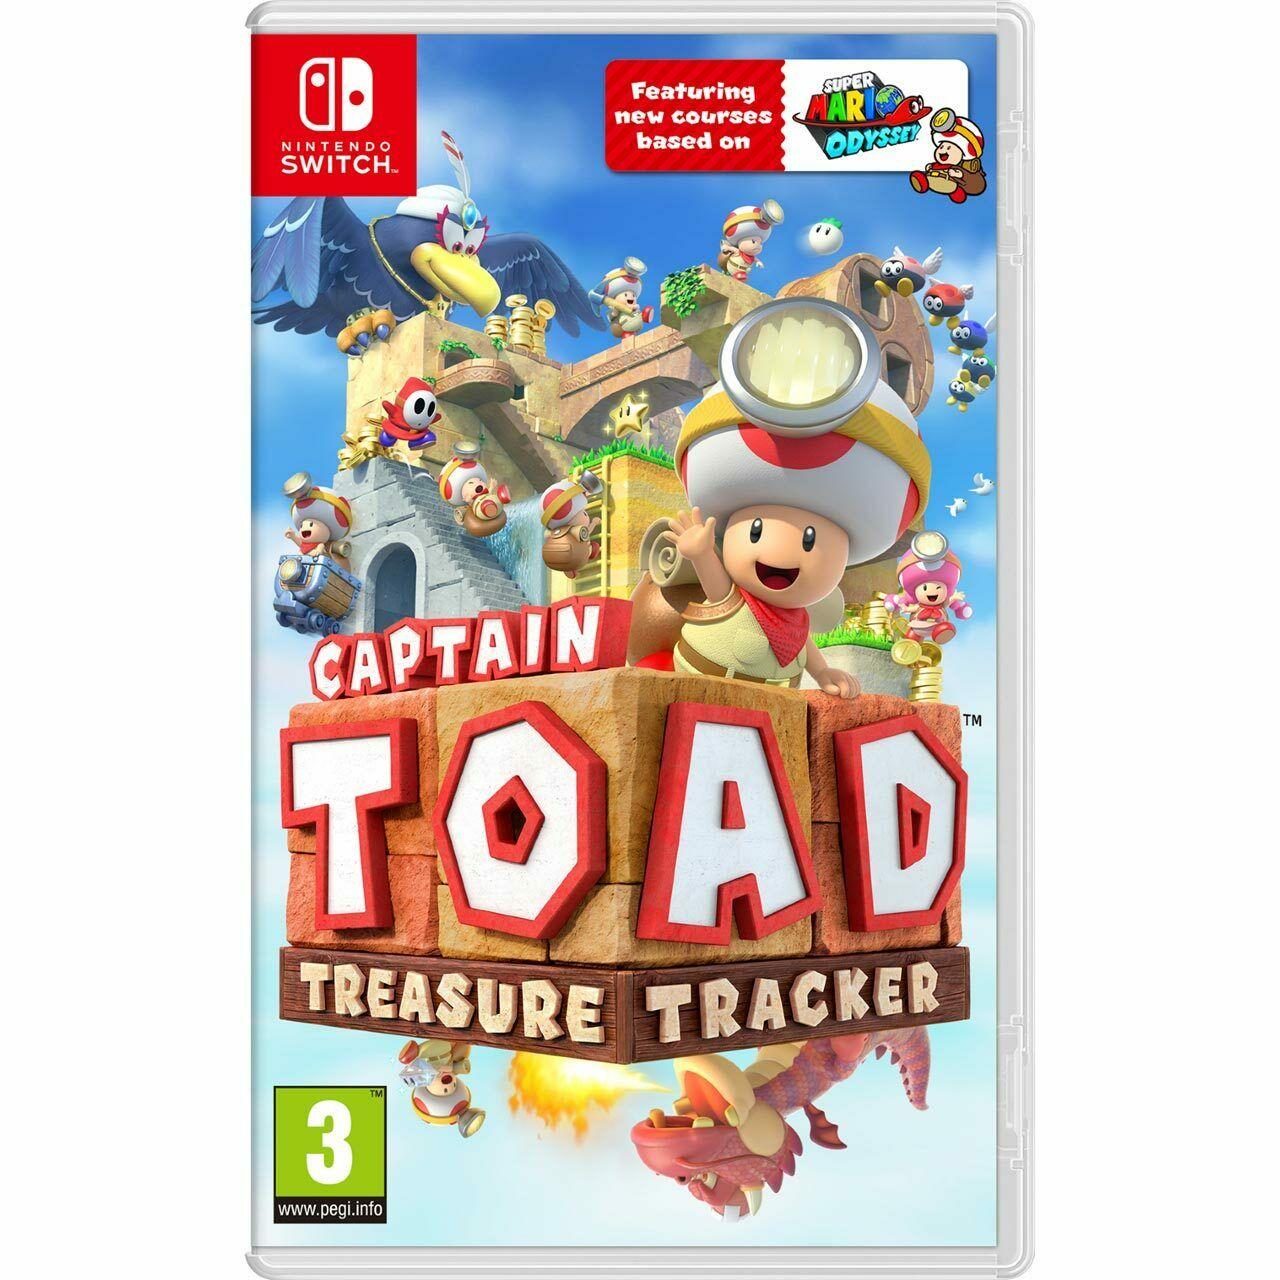 Captain Toad's Treasure Tracker For Nintendo Switch, £27 at AO / ebay (UK mainland)